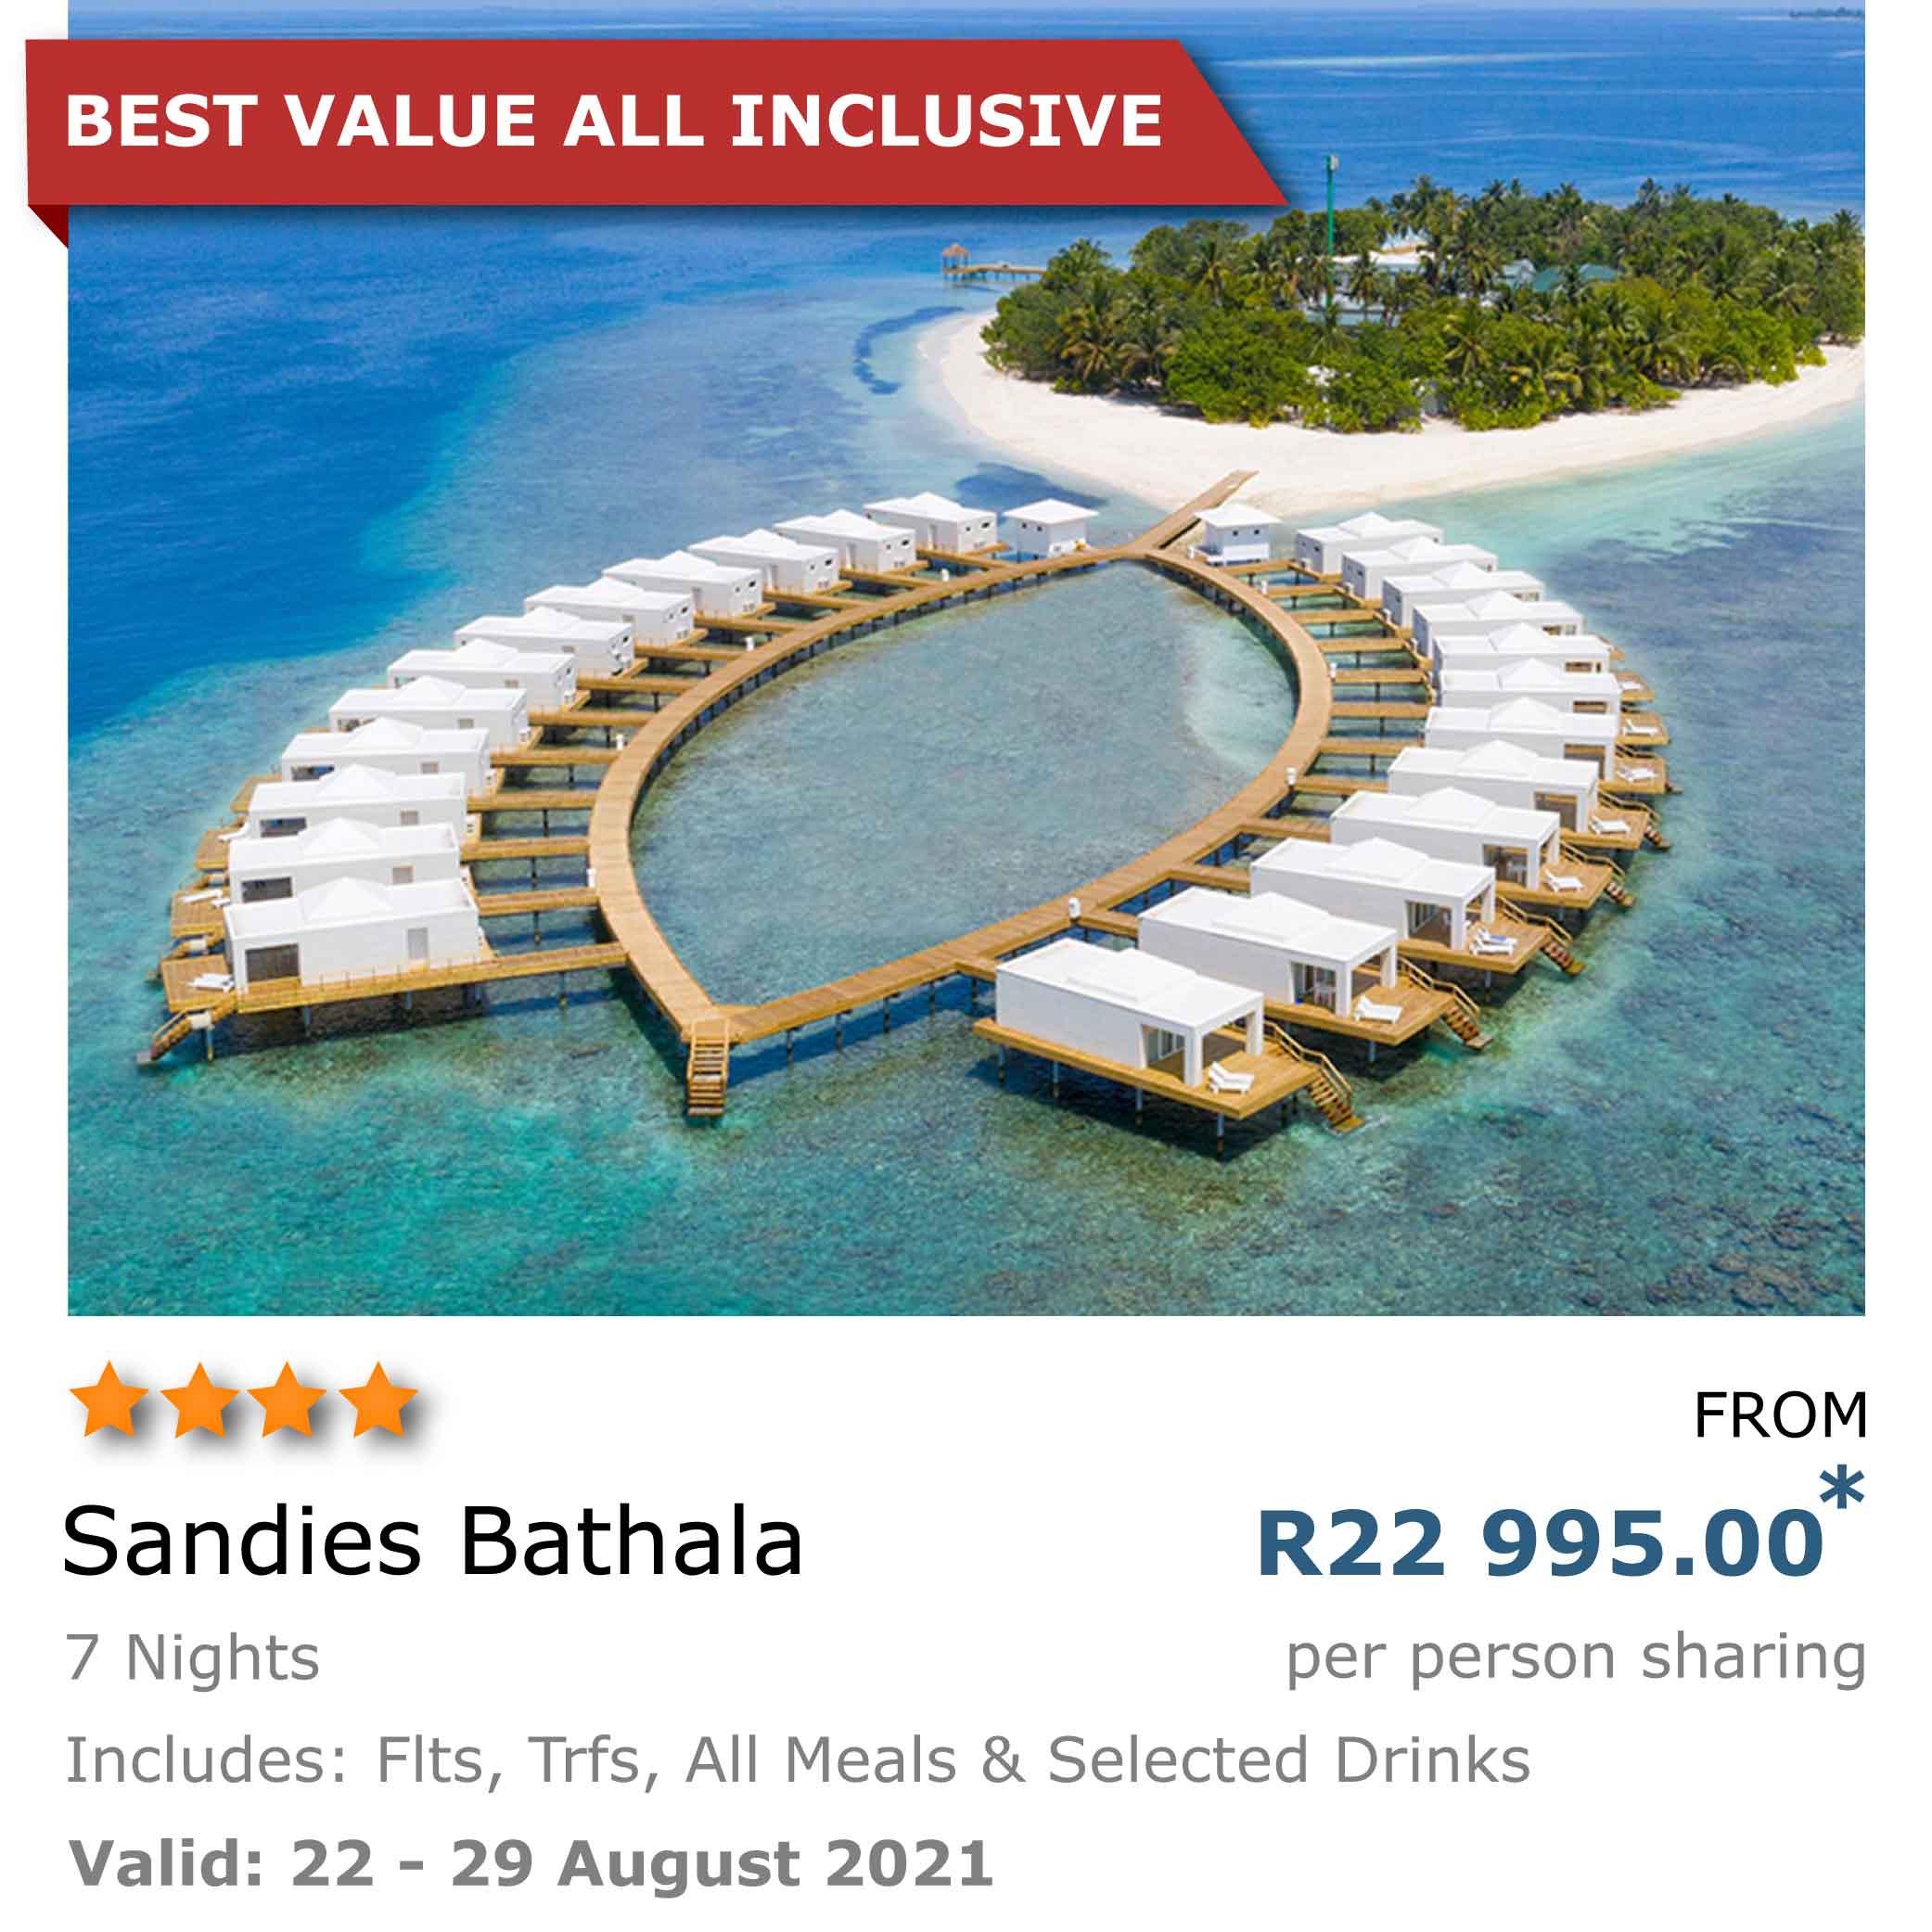 Sandies Bathala